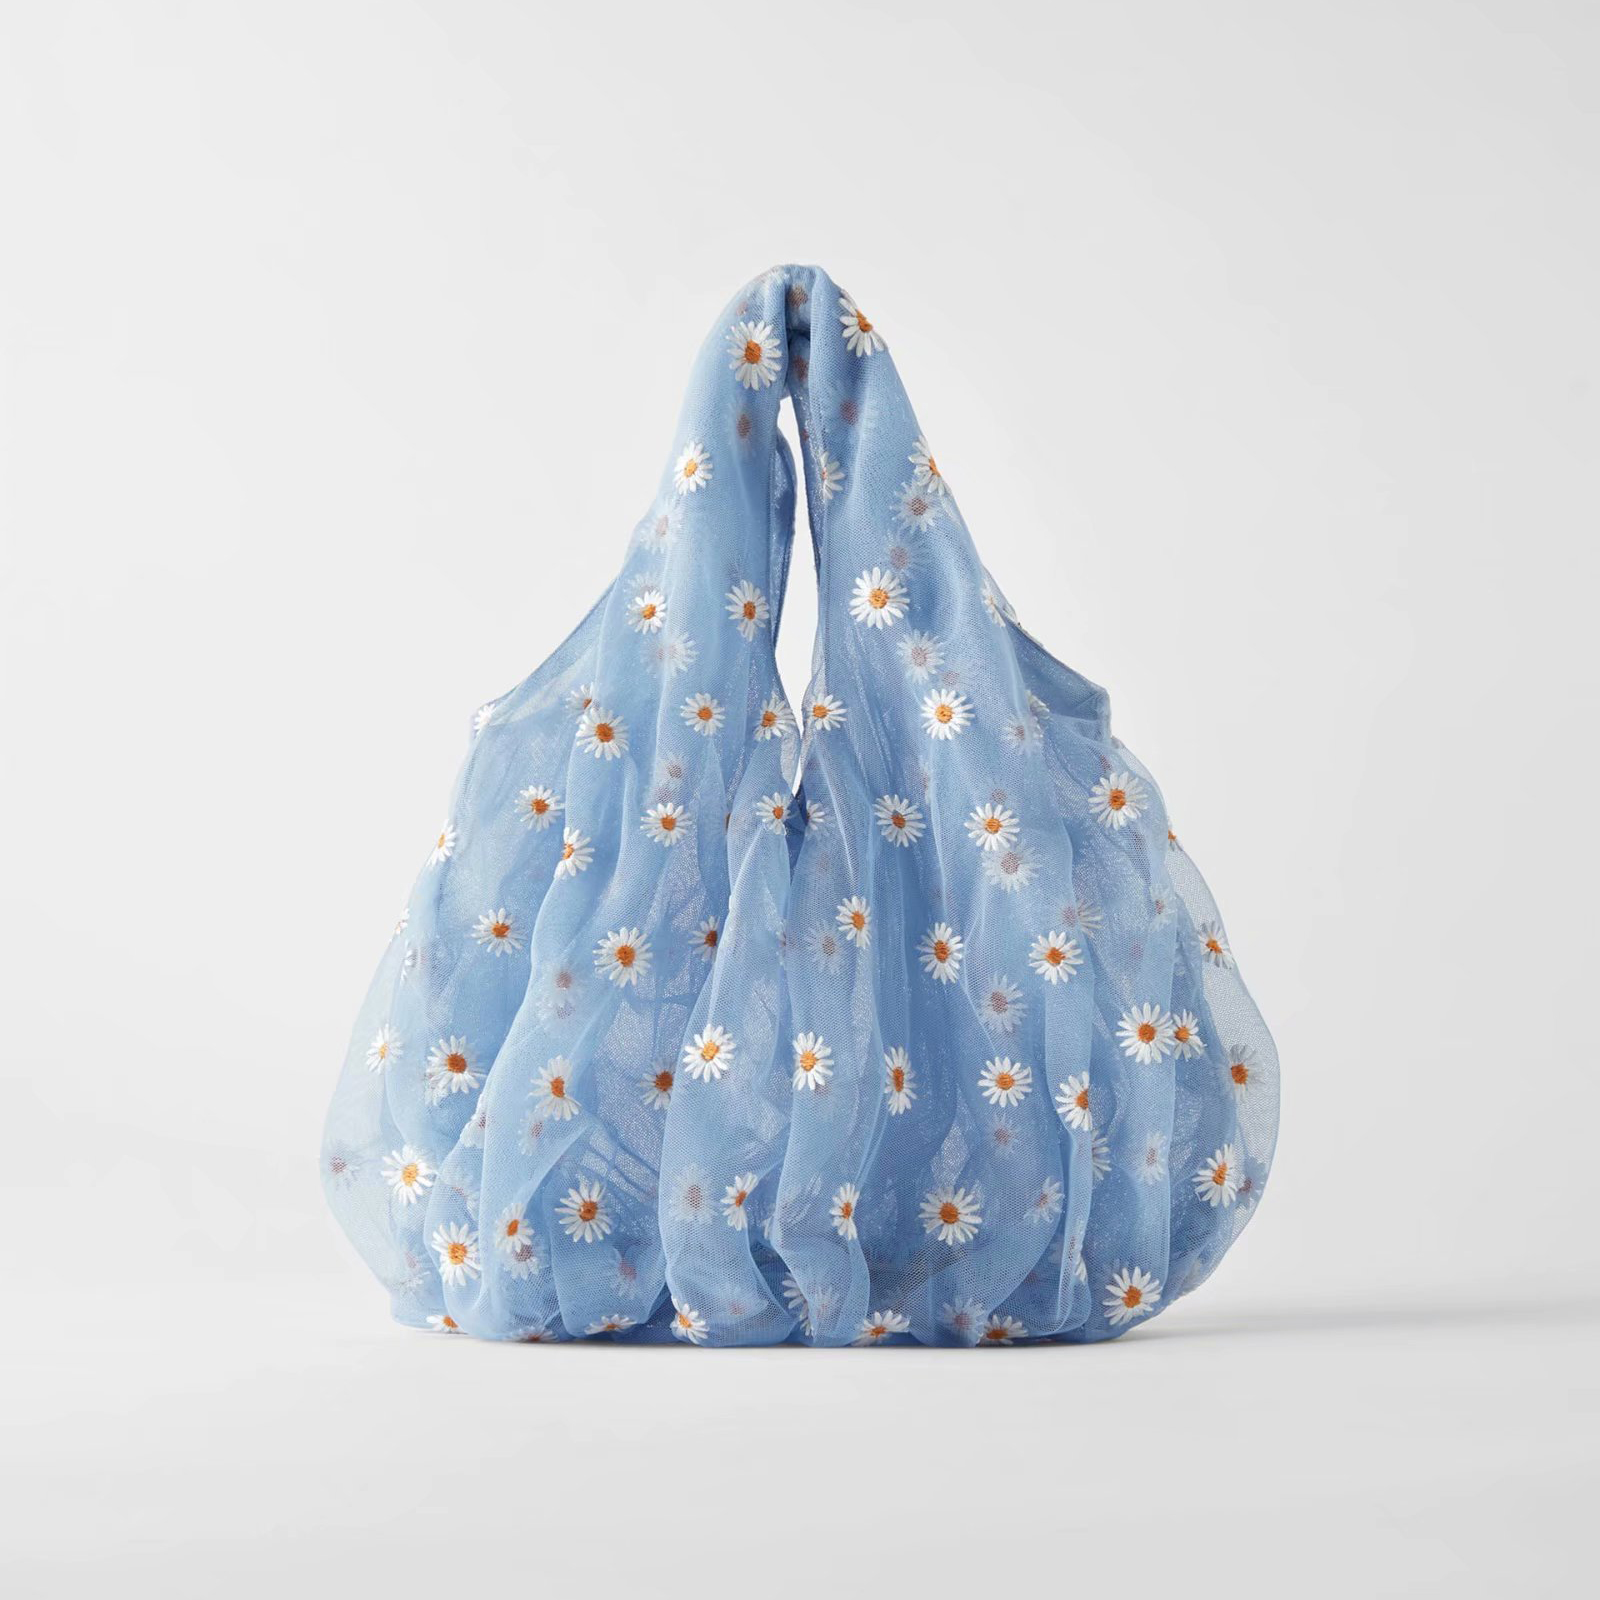 Za 1:1 Women Bag Floral Printed Chiffon Handbag